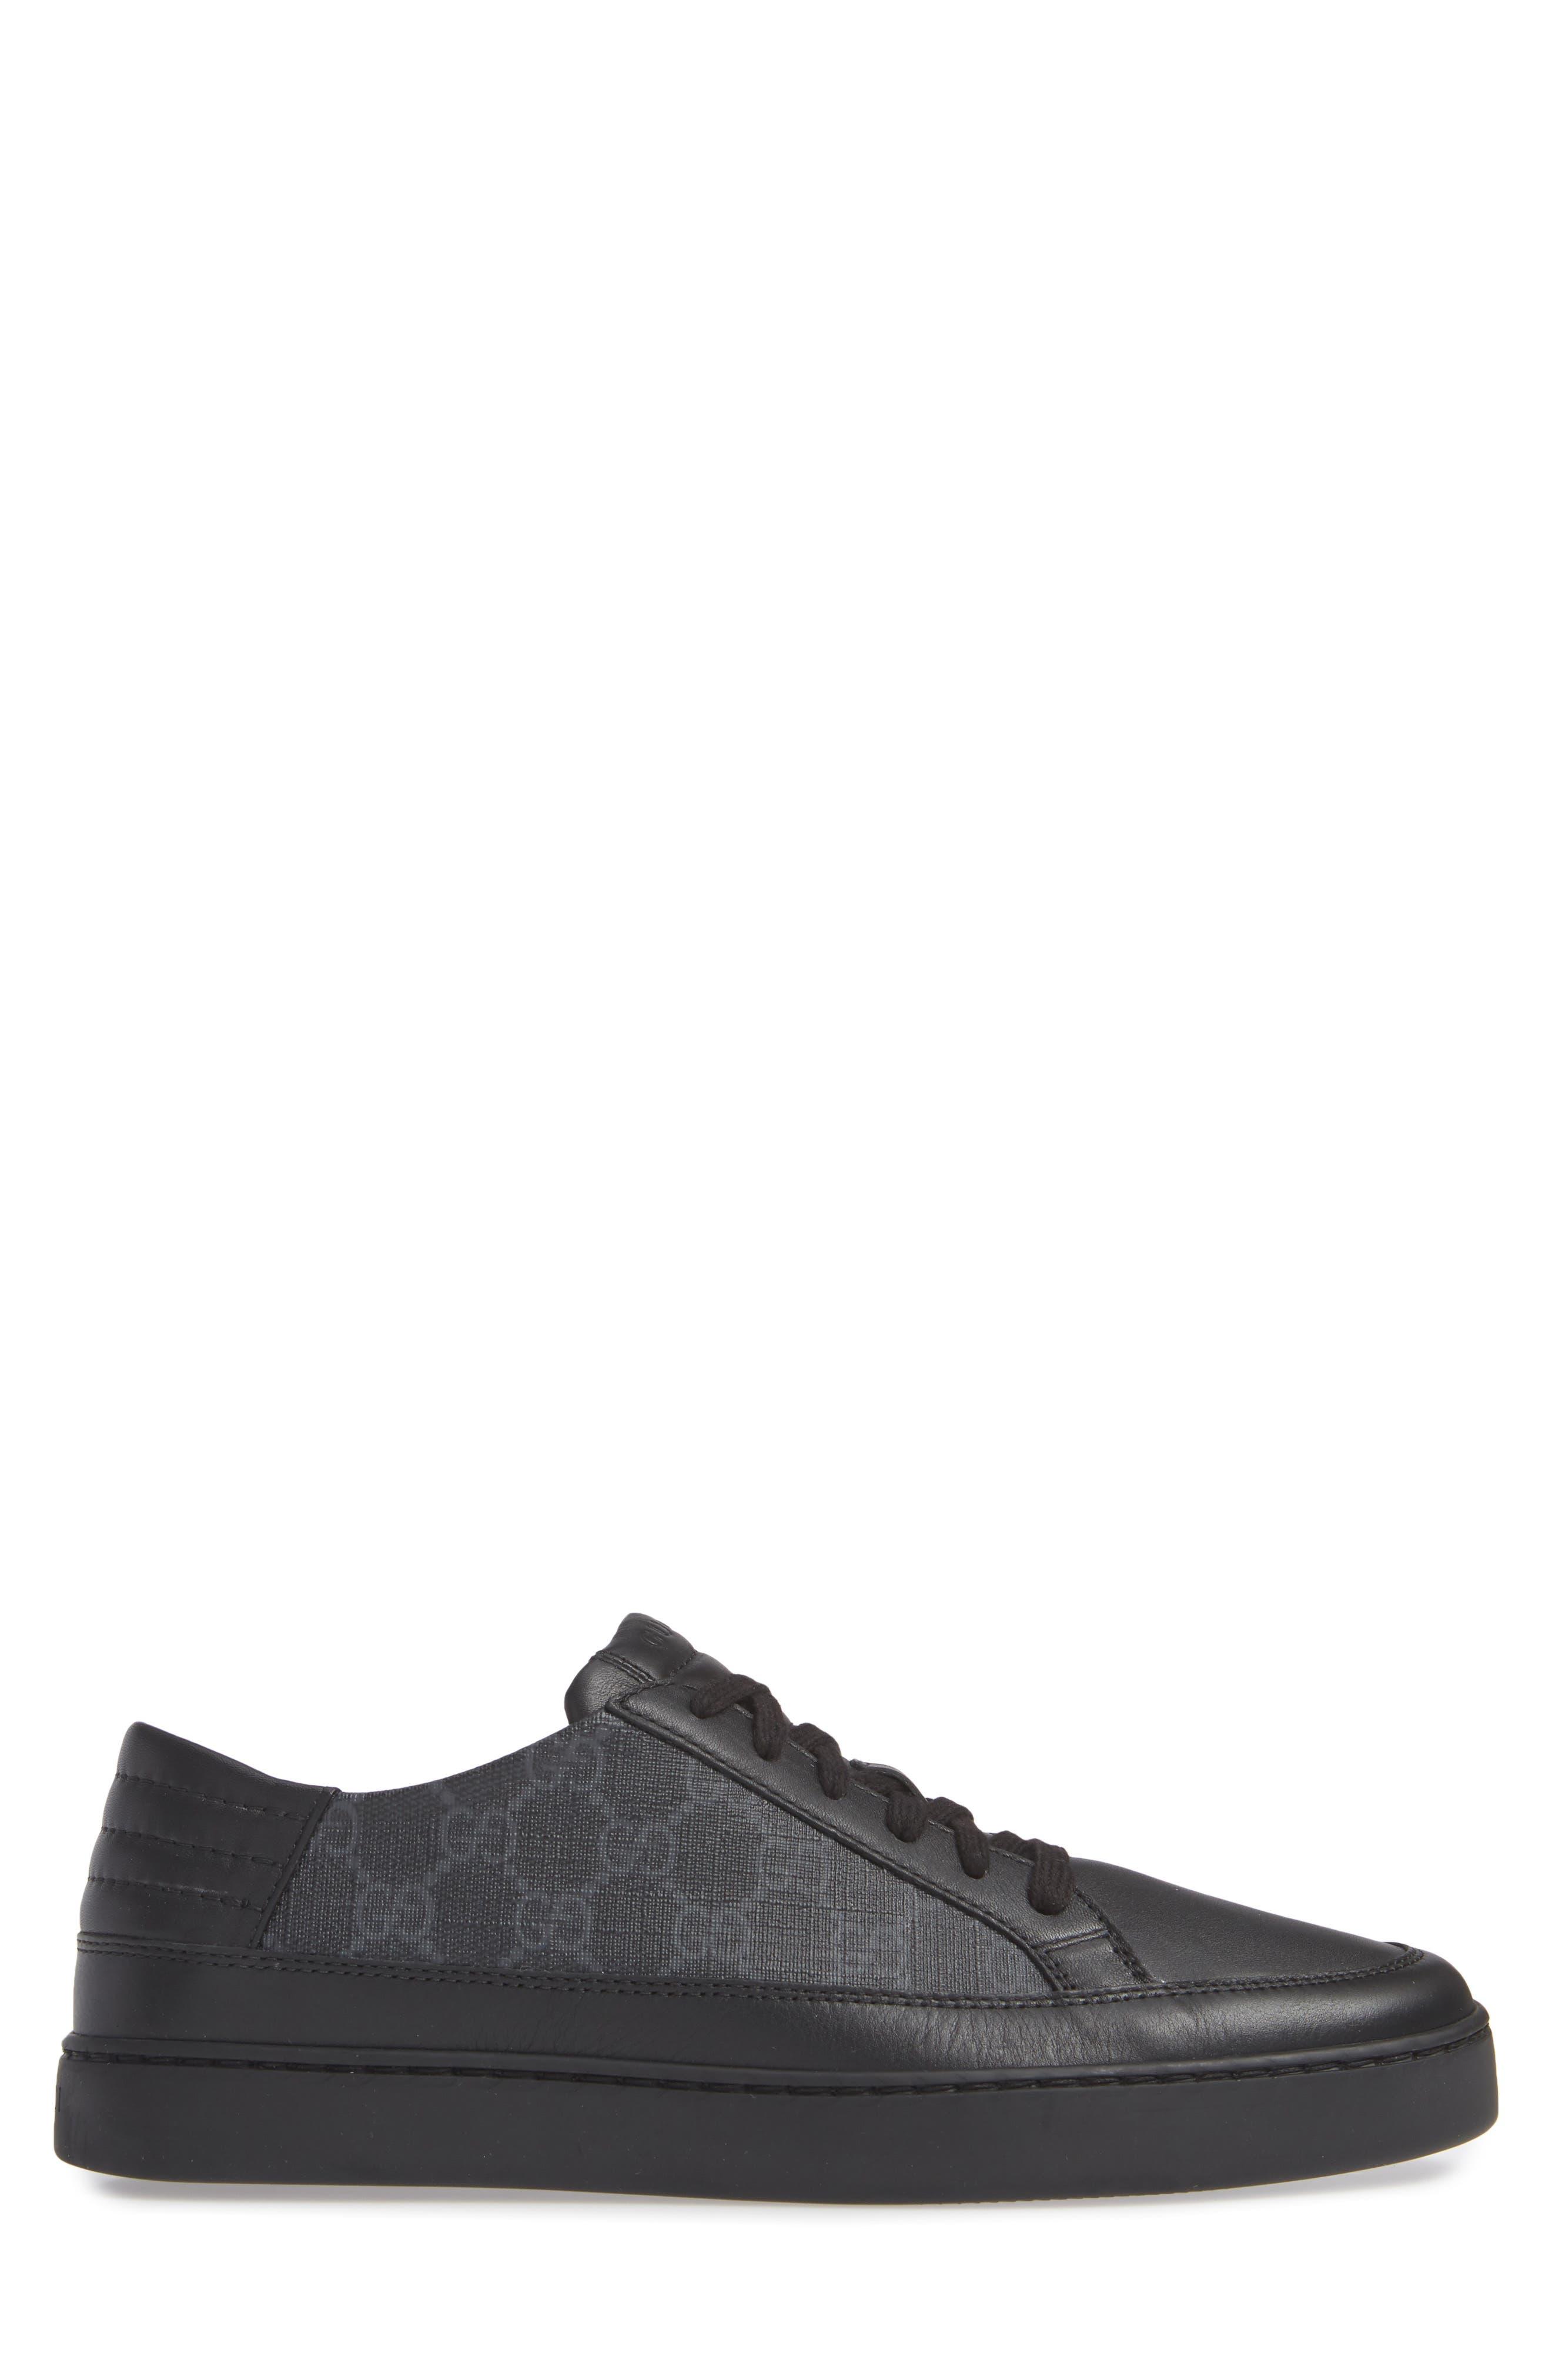 'Common' Low-Top Sneaker,                             Alternate thumbnail 3, color,                             NERO/ BLACK